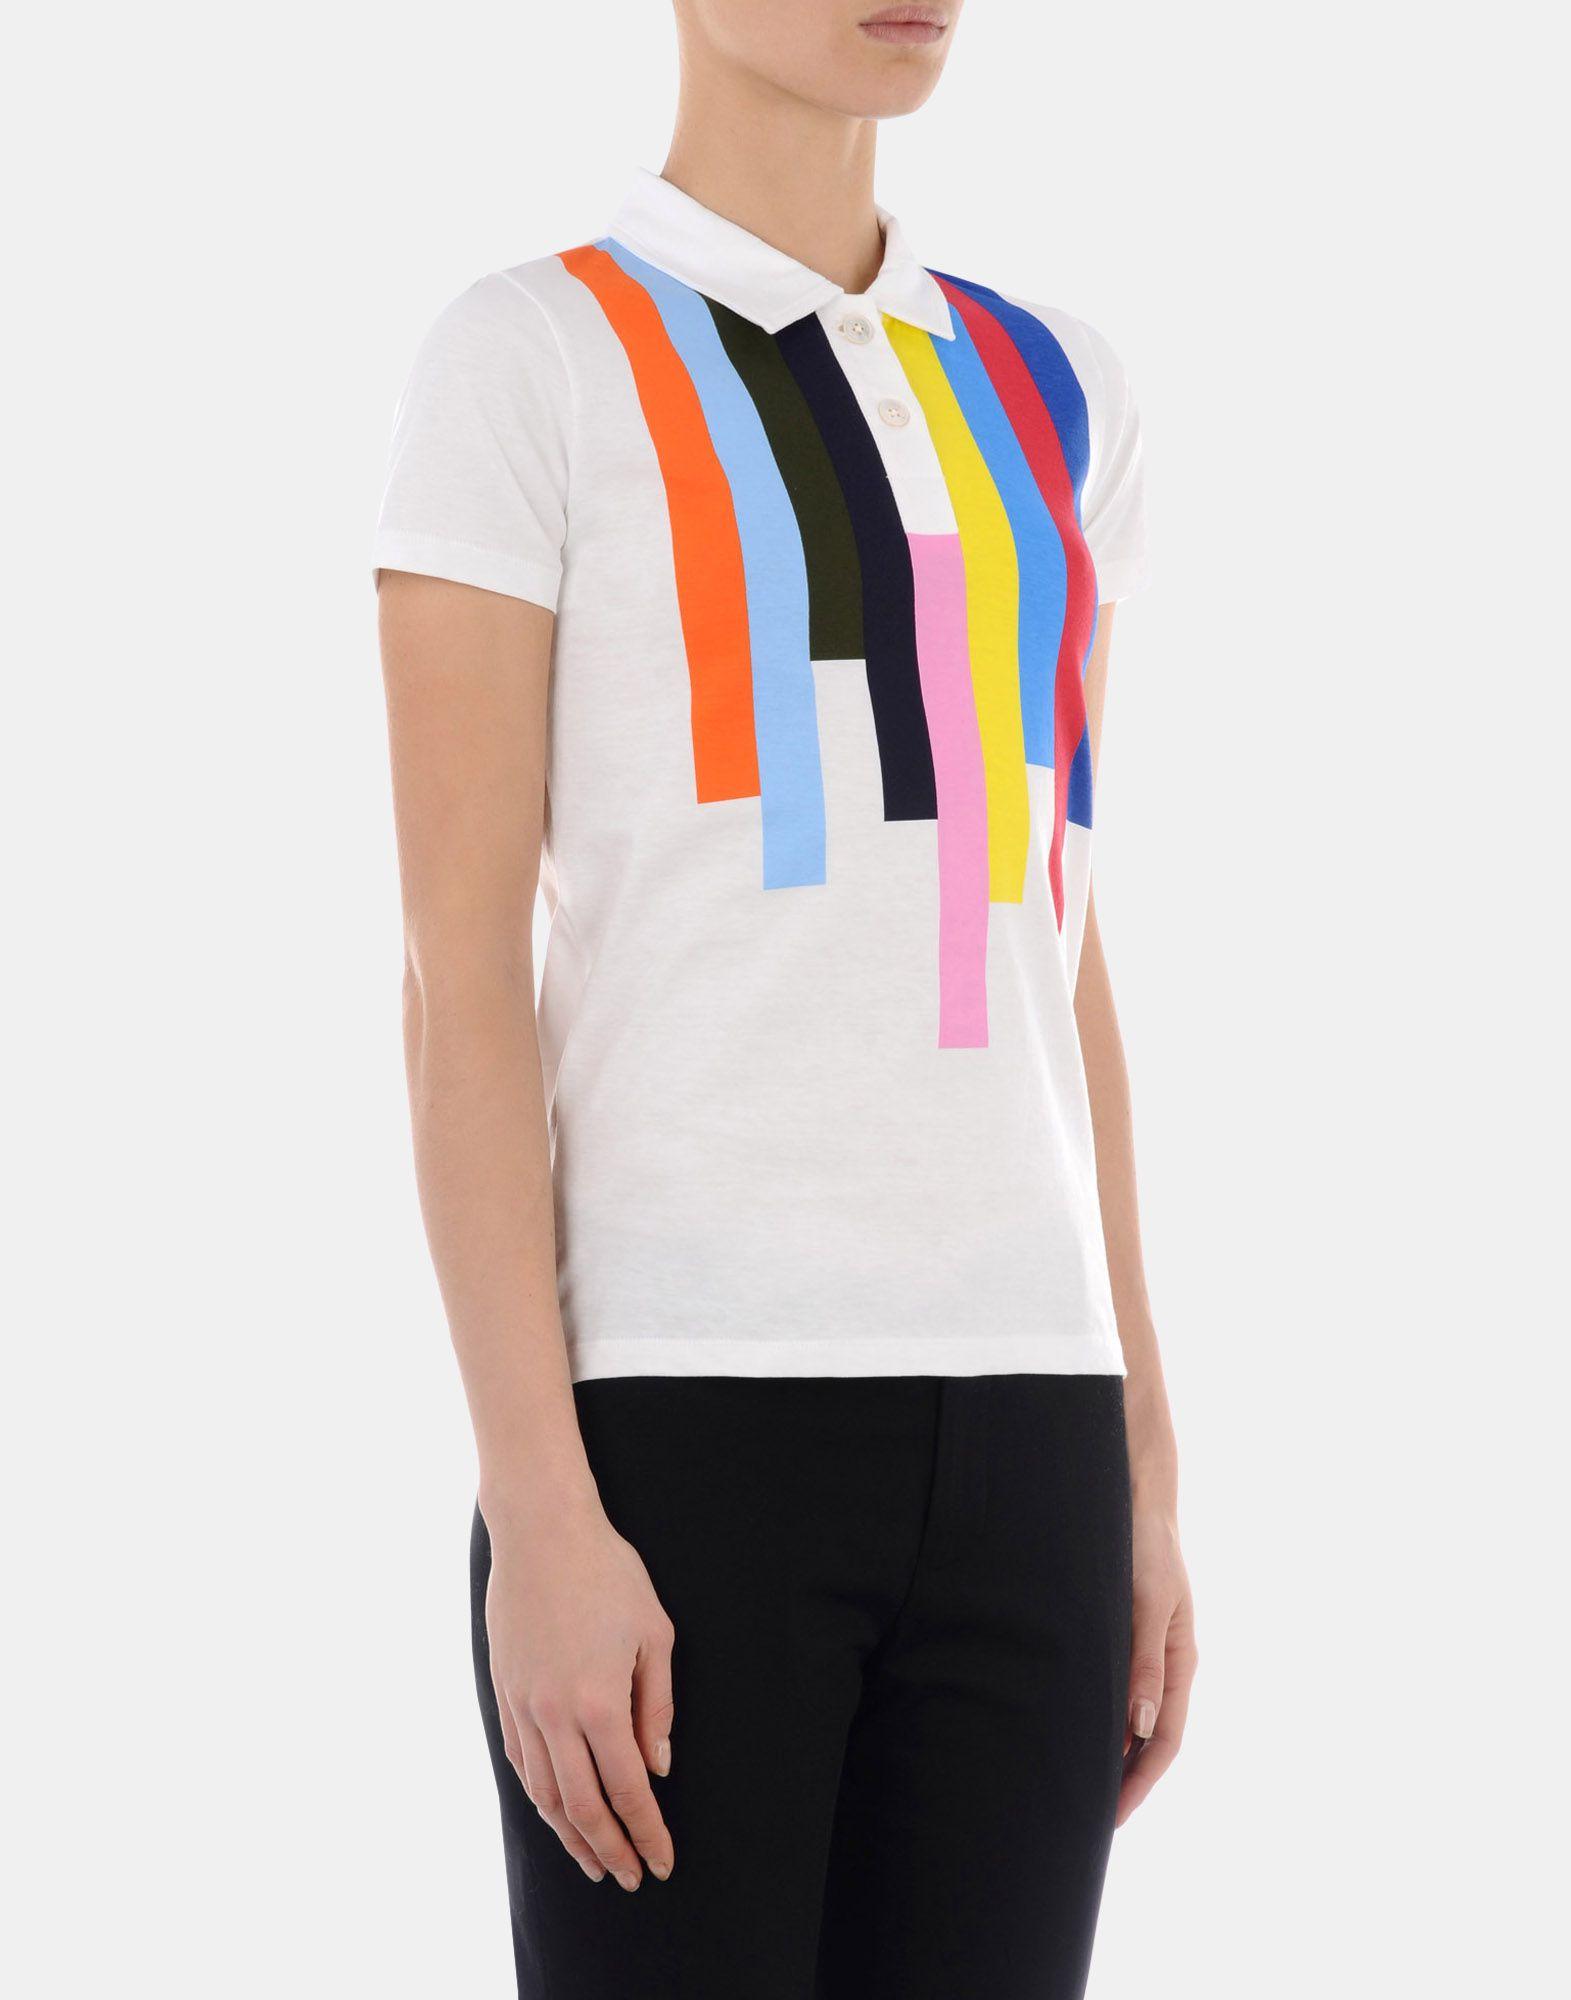 100% Original Online 100% Original SHIRTS - Shirts Jil Sander Quality For Sale Free Shipping VDDpxha